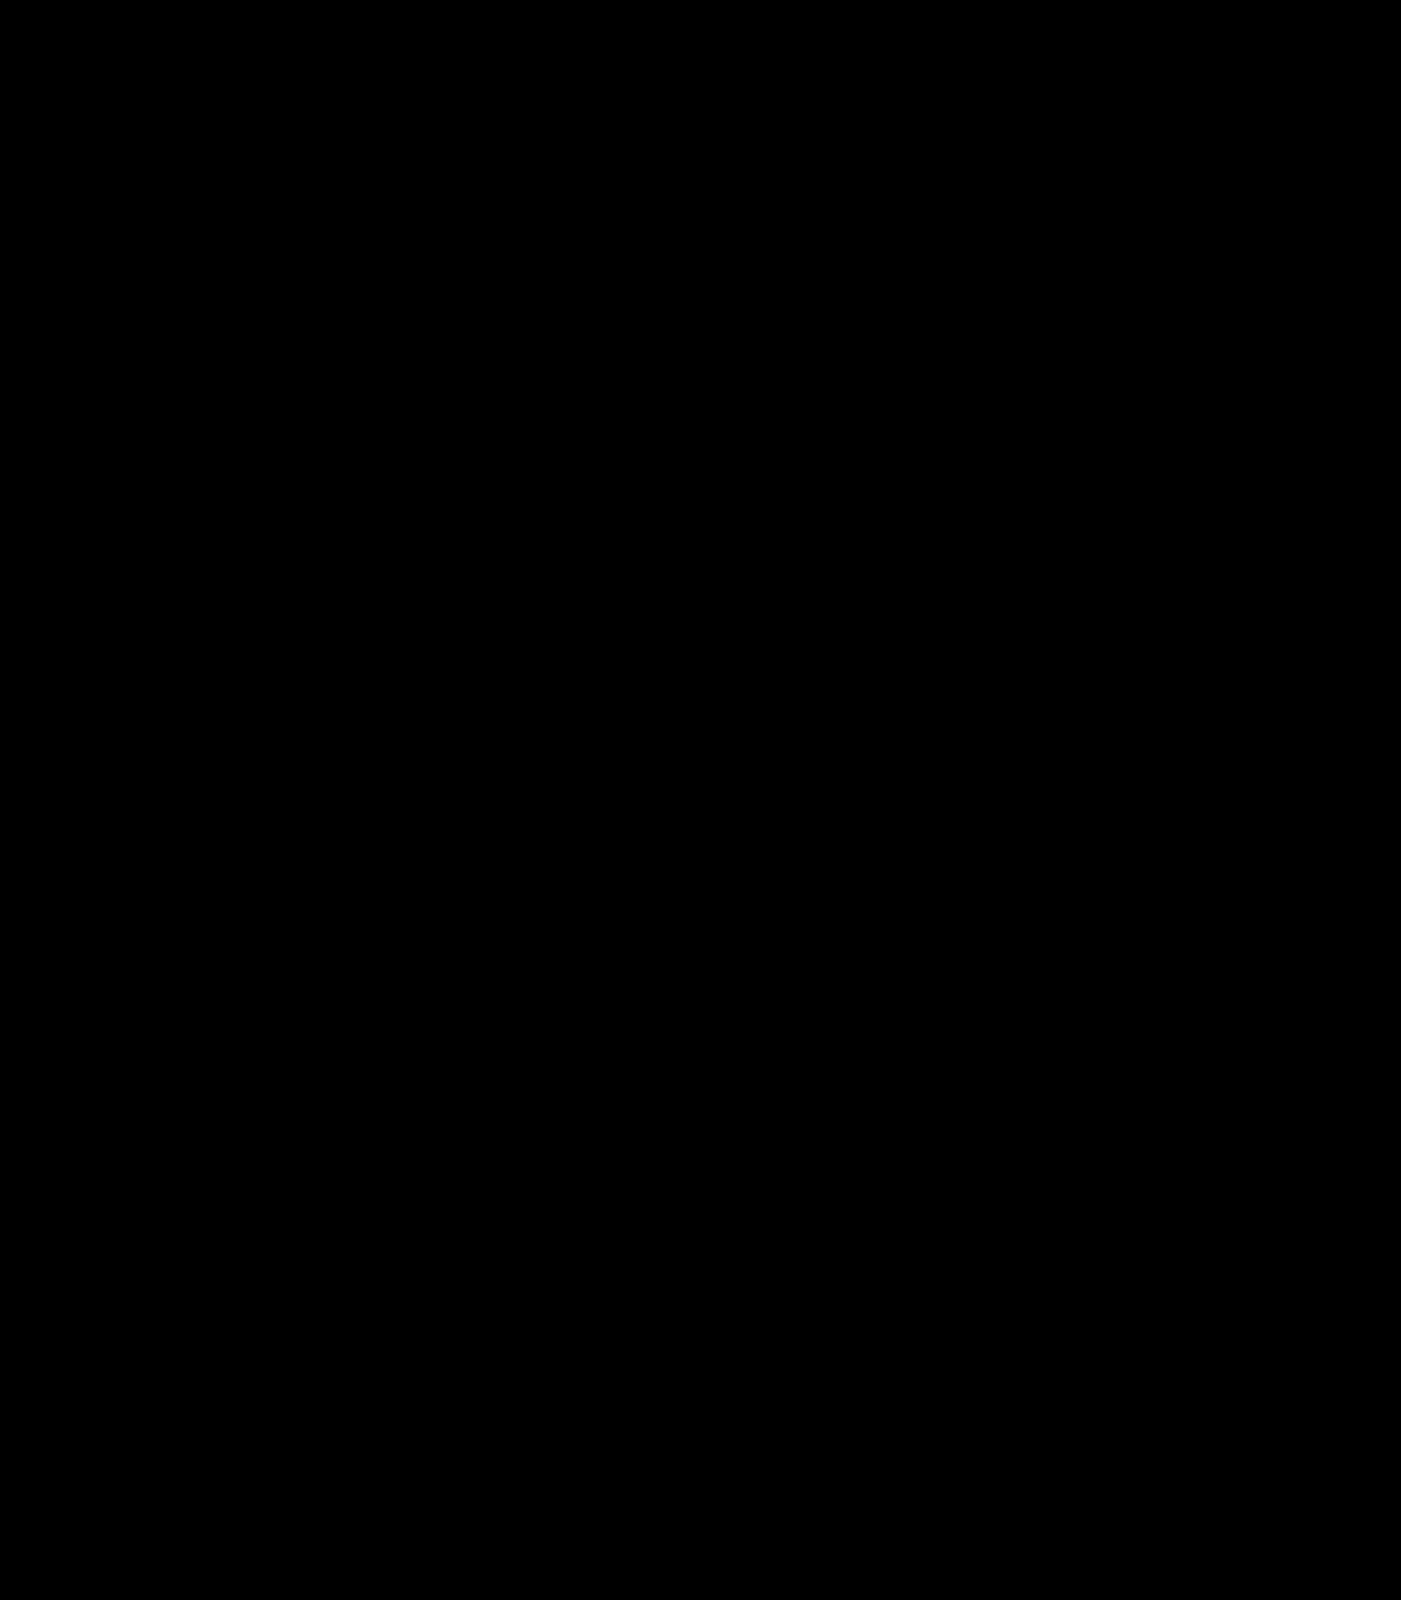 pregnant, flower, silhouette, woman, mother, new, baby, holding, beauty, belly, black, body, female, figure, girl, hair, health, life, love, maternity, mom, motherhood, parent, pregnancy, hope